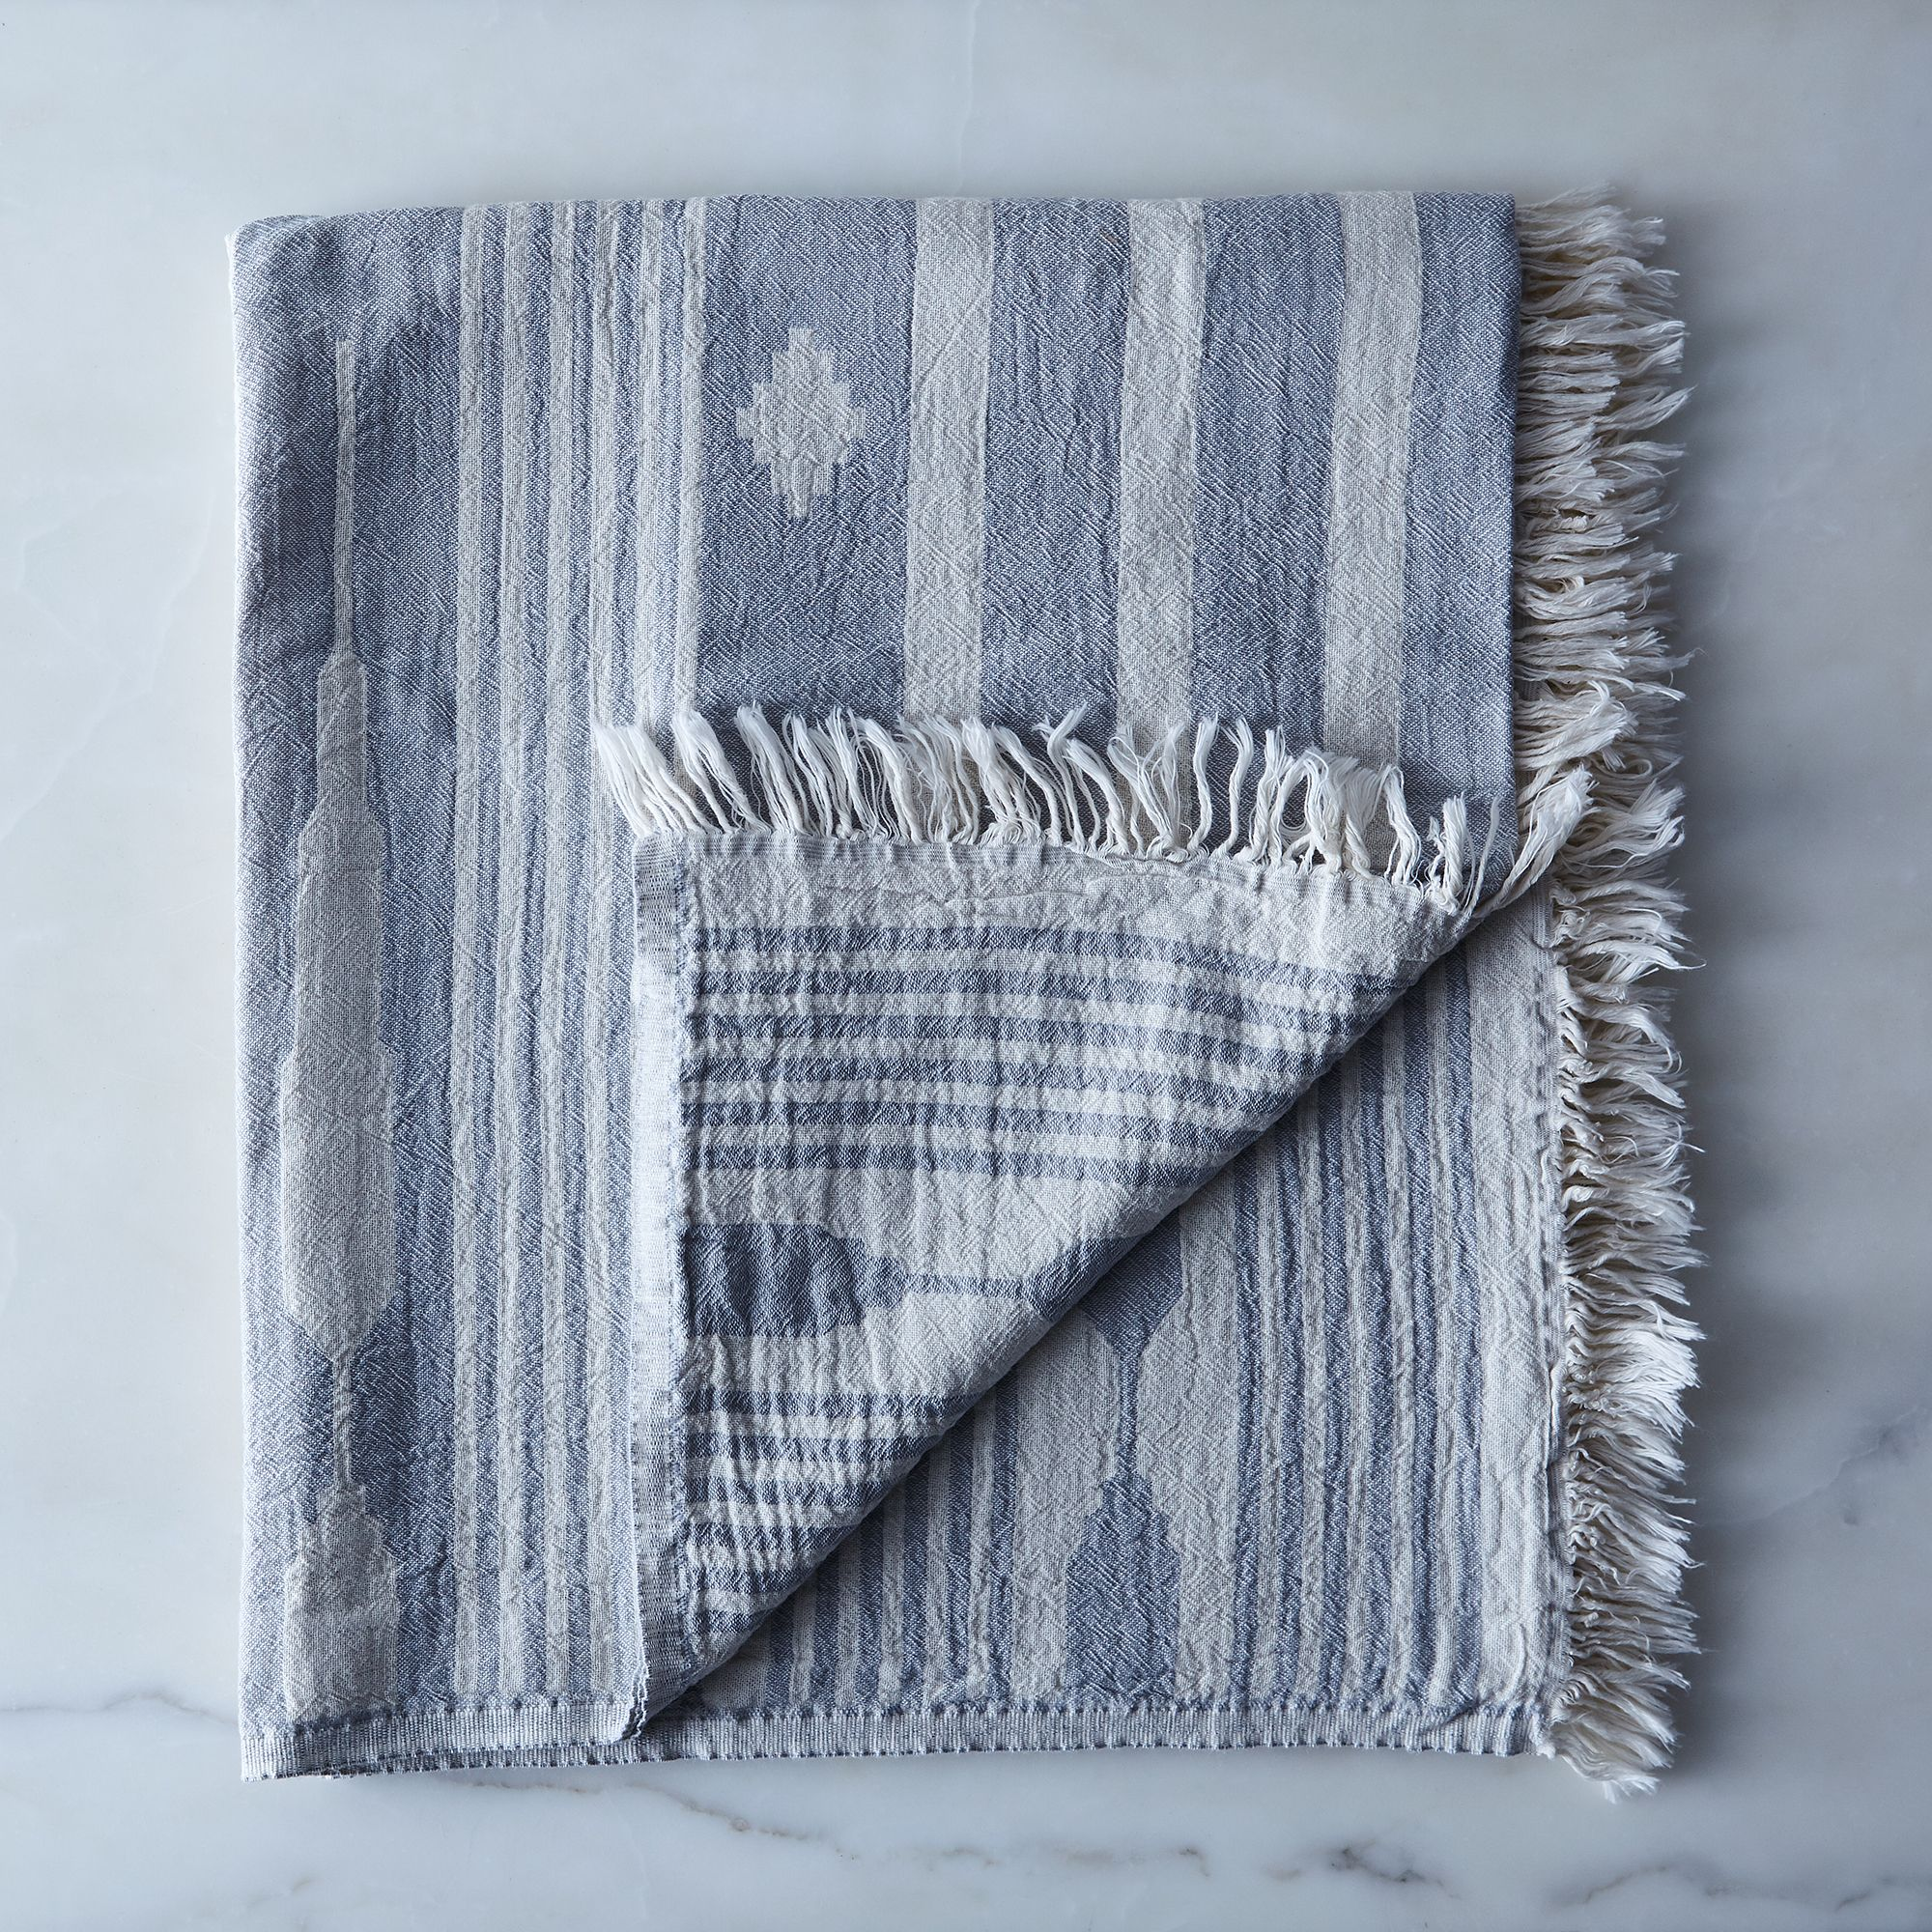 21f14f8c 1387 4de7 b40d 6ba49755fe70  2017 0516 turkish t arrow turkish cotton fringe towel gray silo rocky luten 040